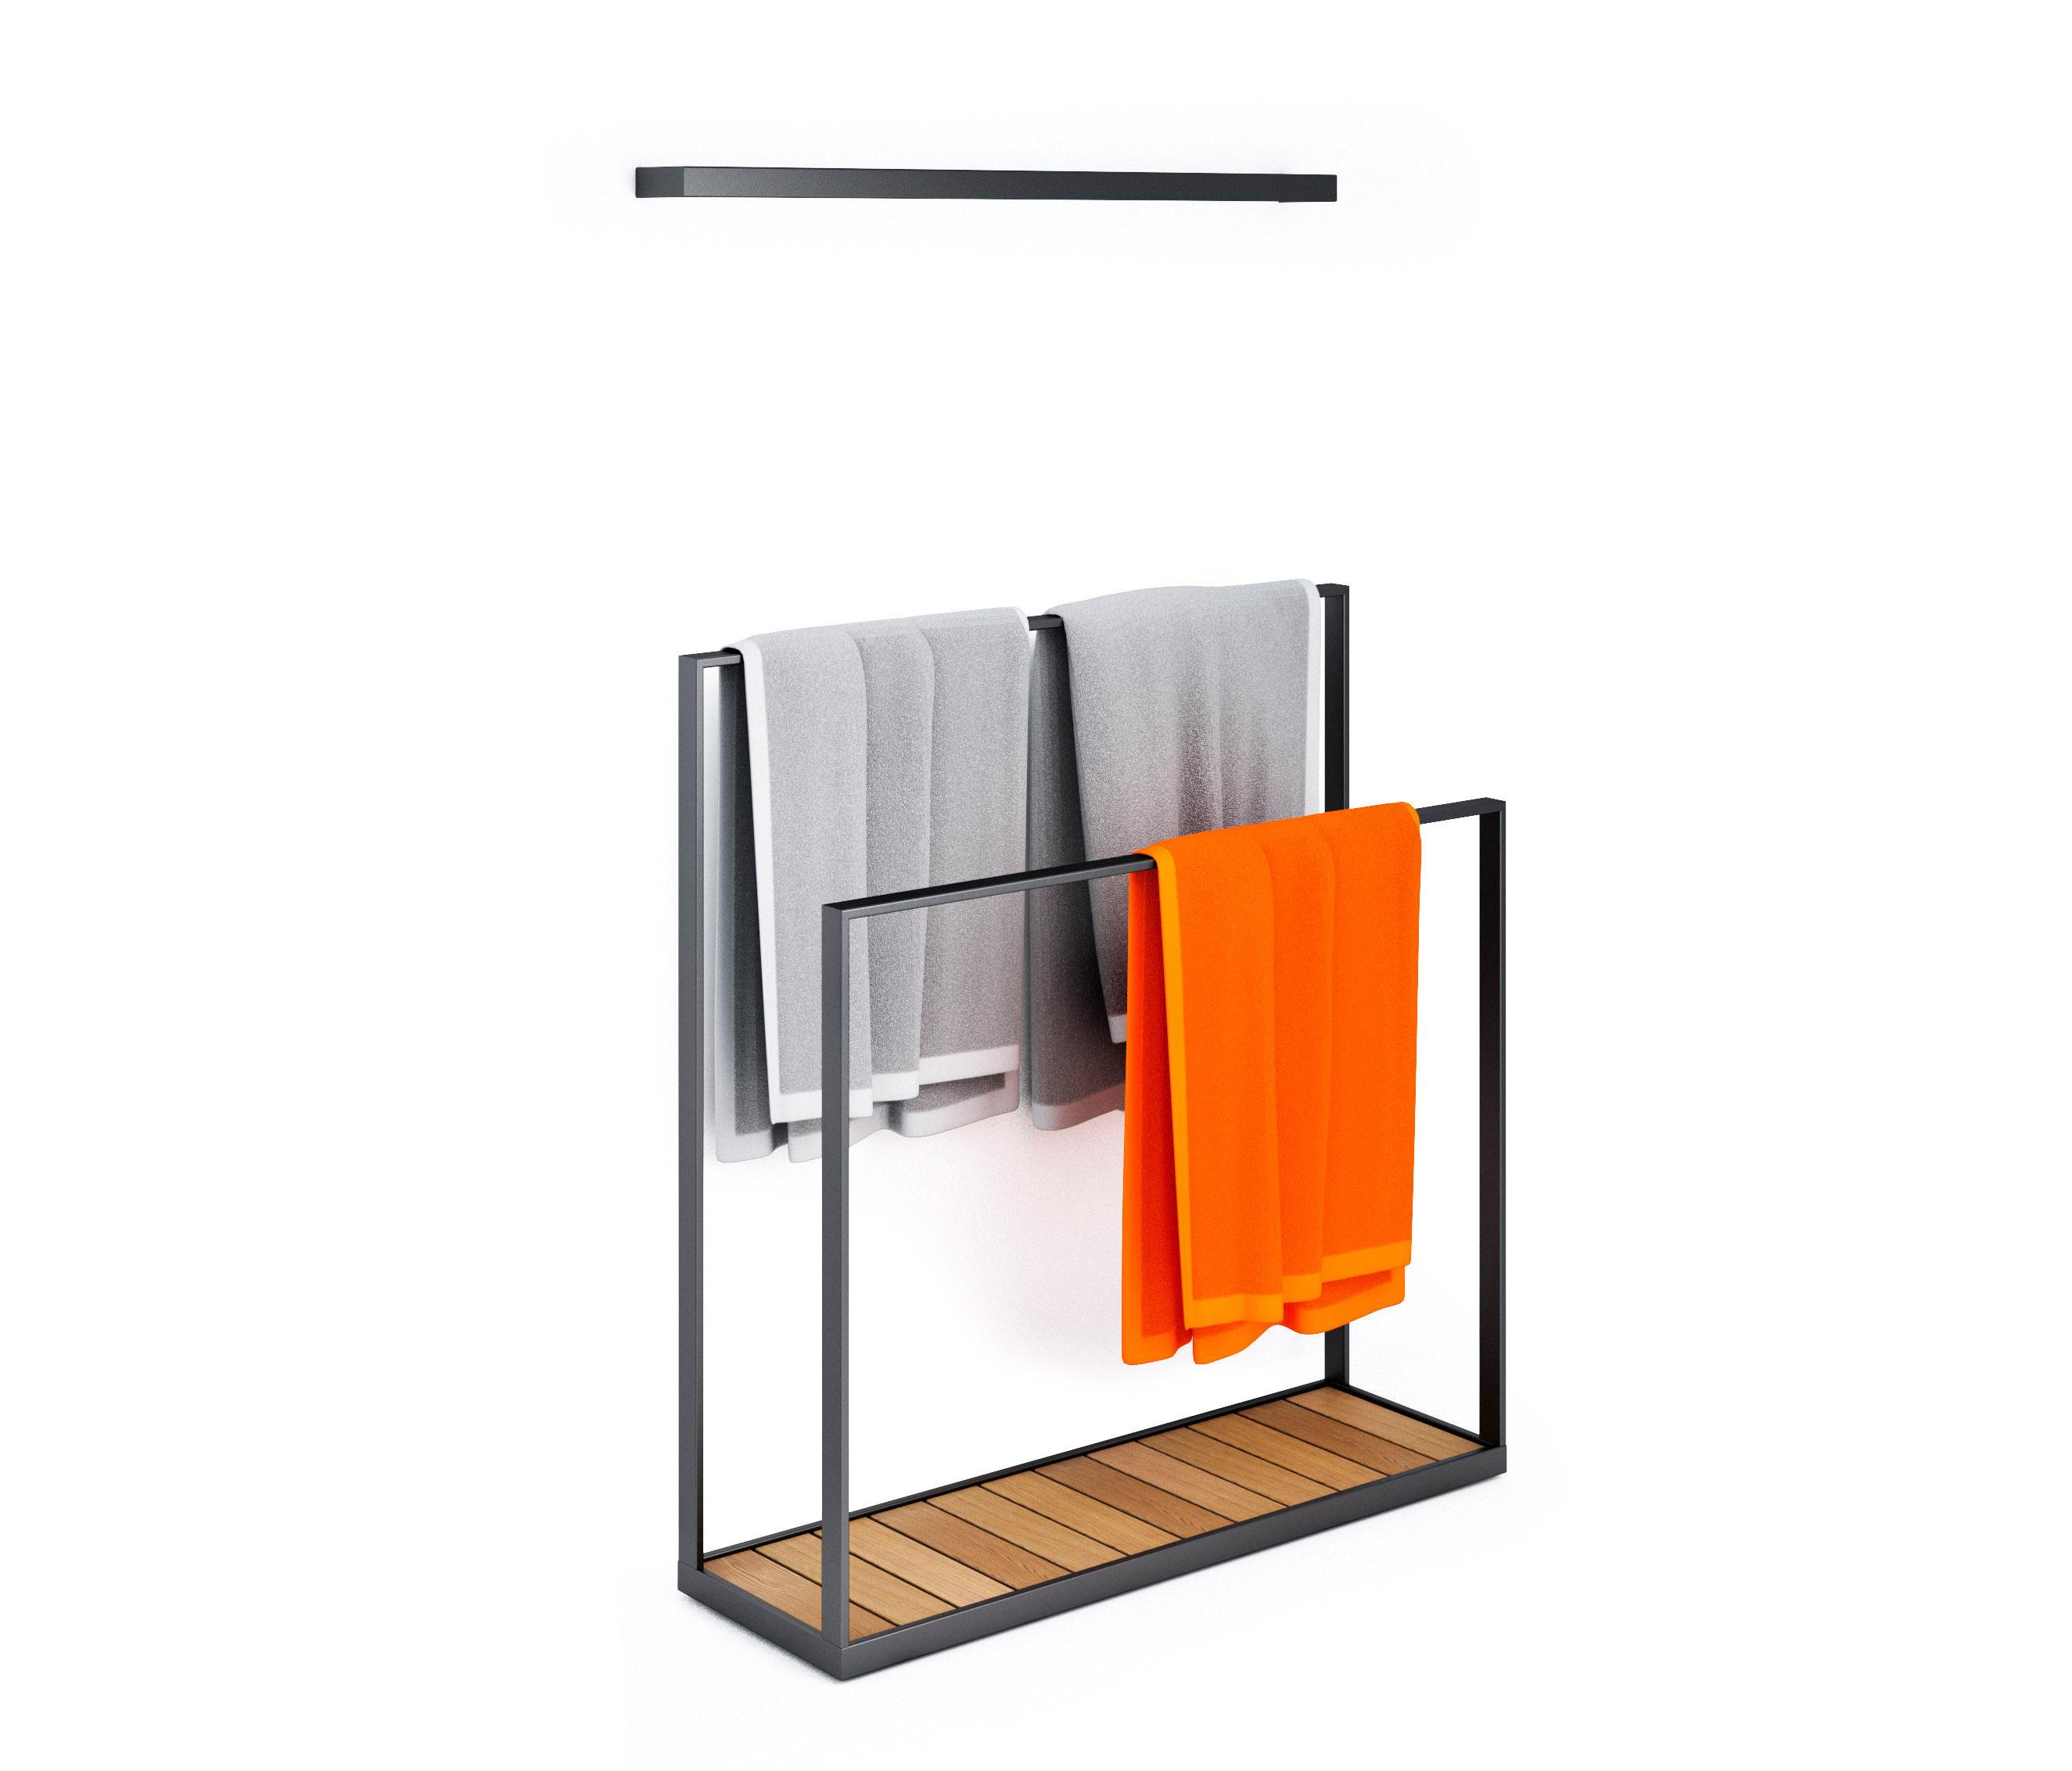 Towel Hanger Garden Towel Hanger Towel Rails From Rapshults Architonic